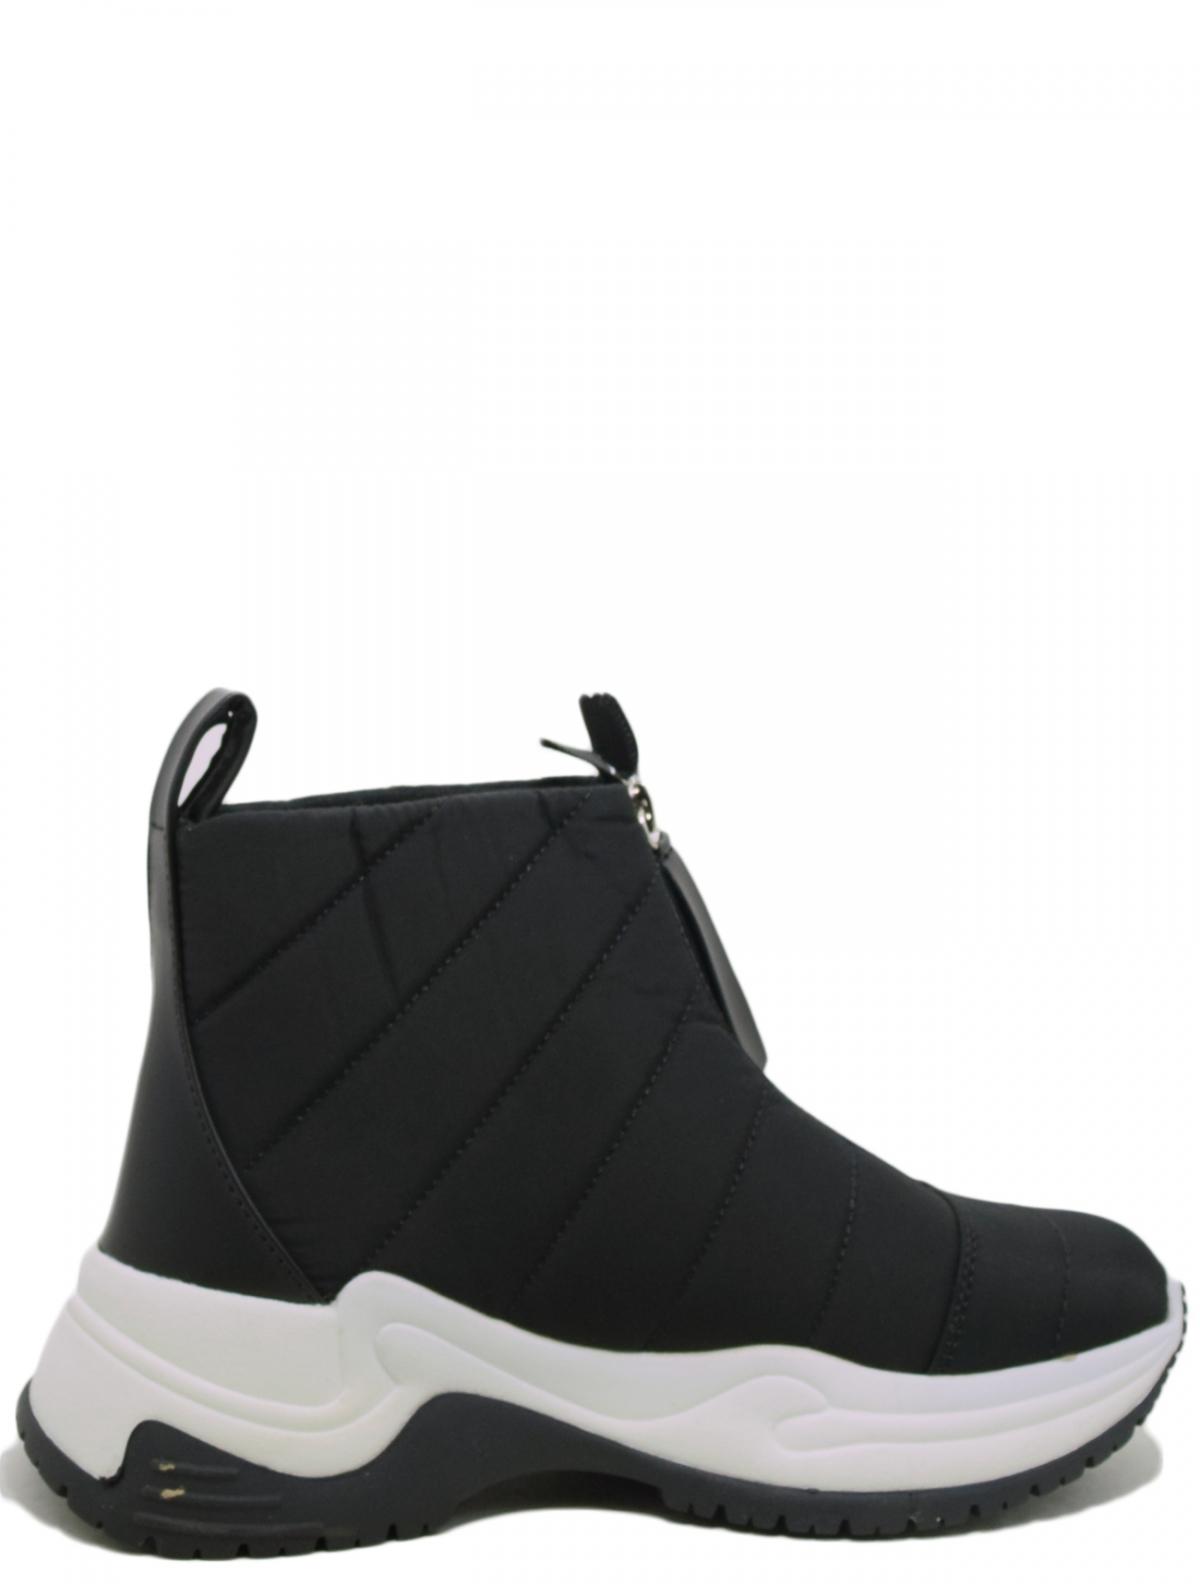 Rio Fiore LTW0307-L55-3 женские ботинки